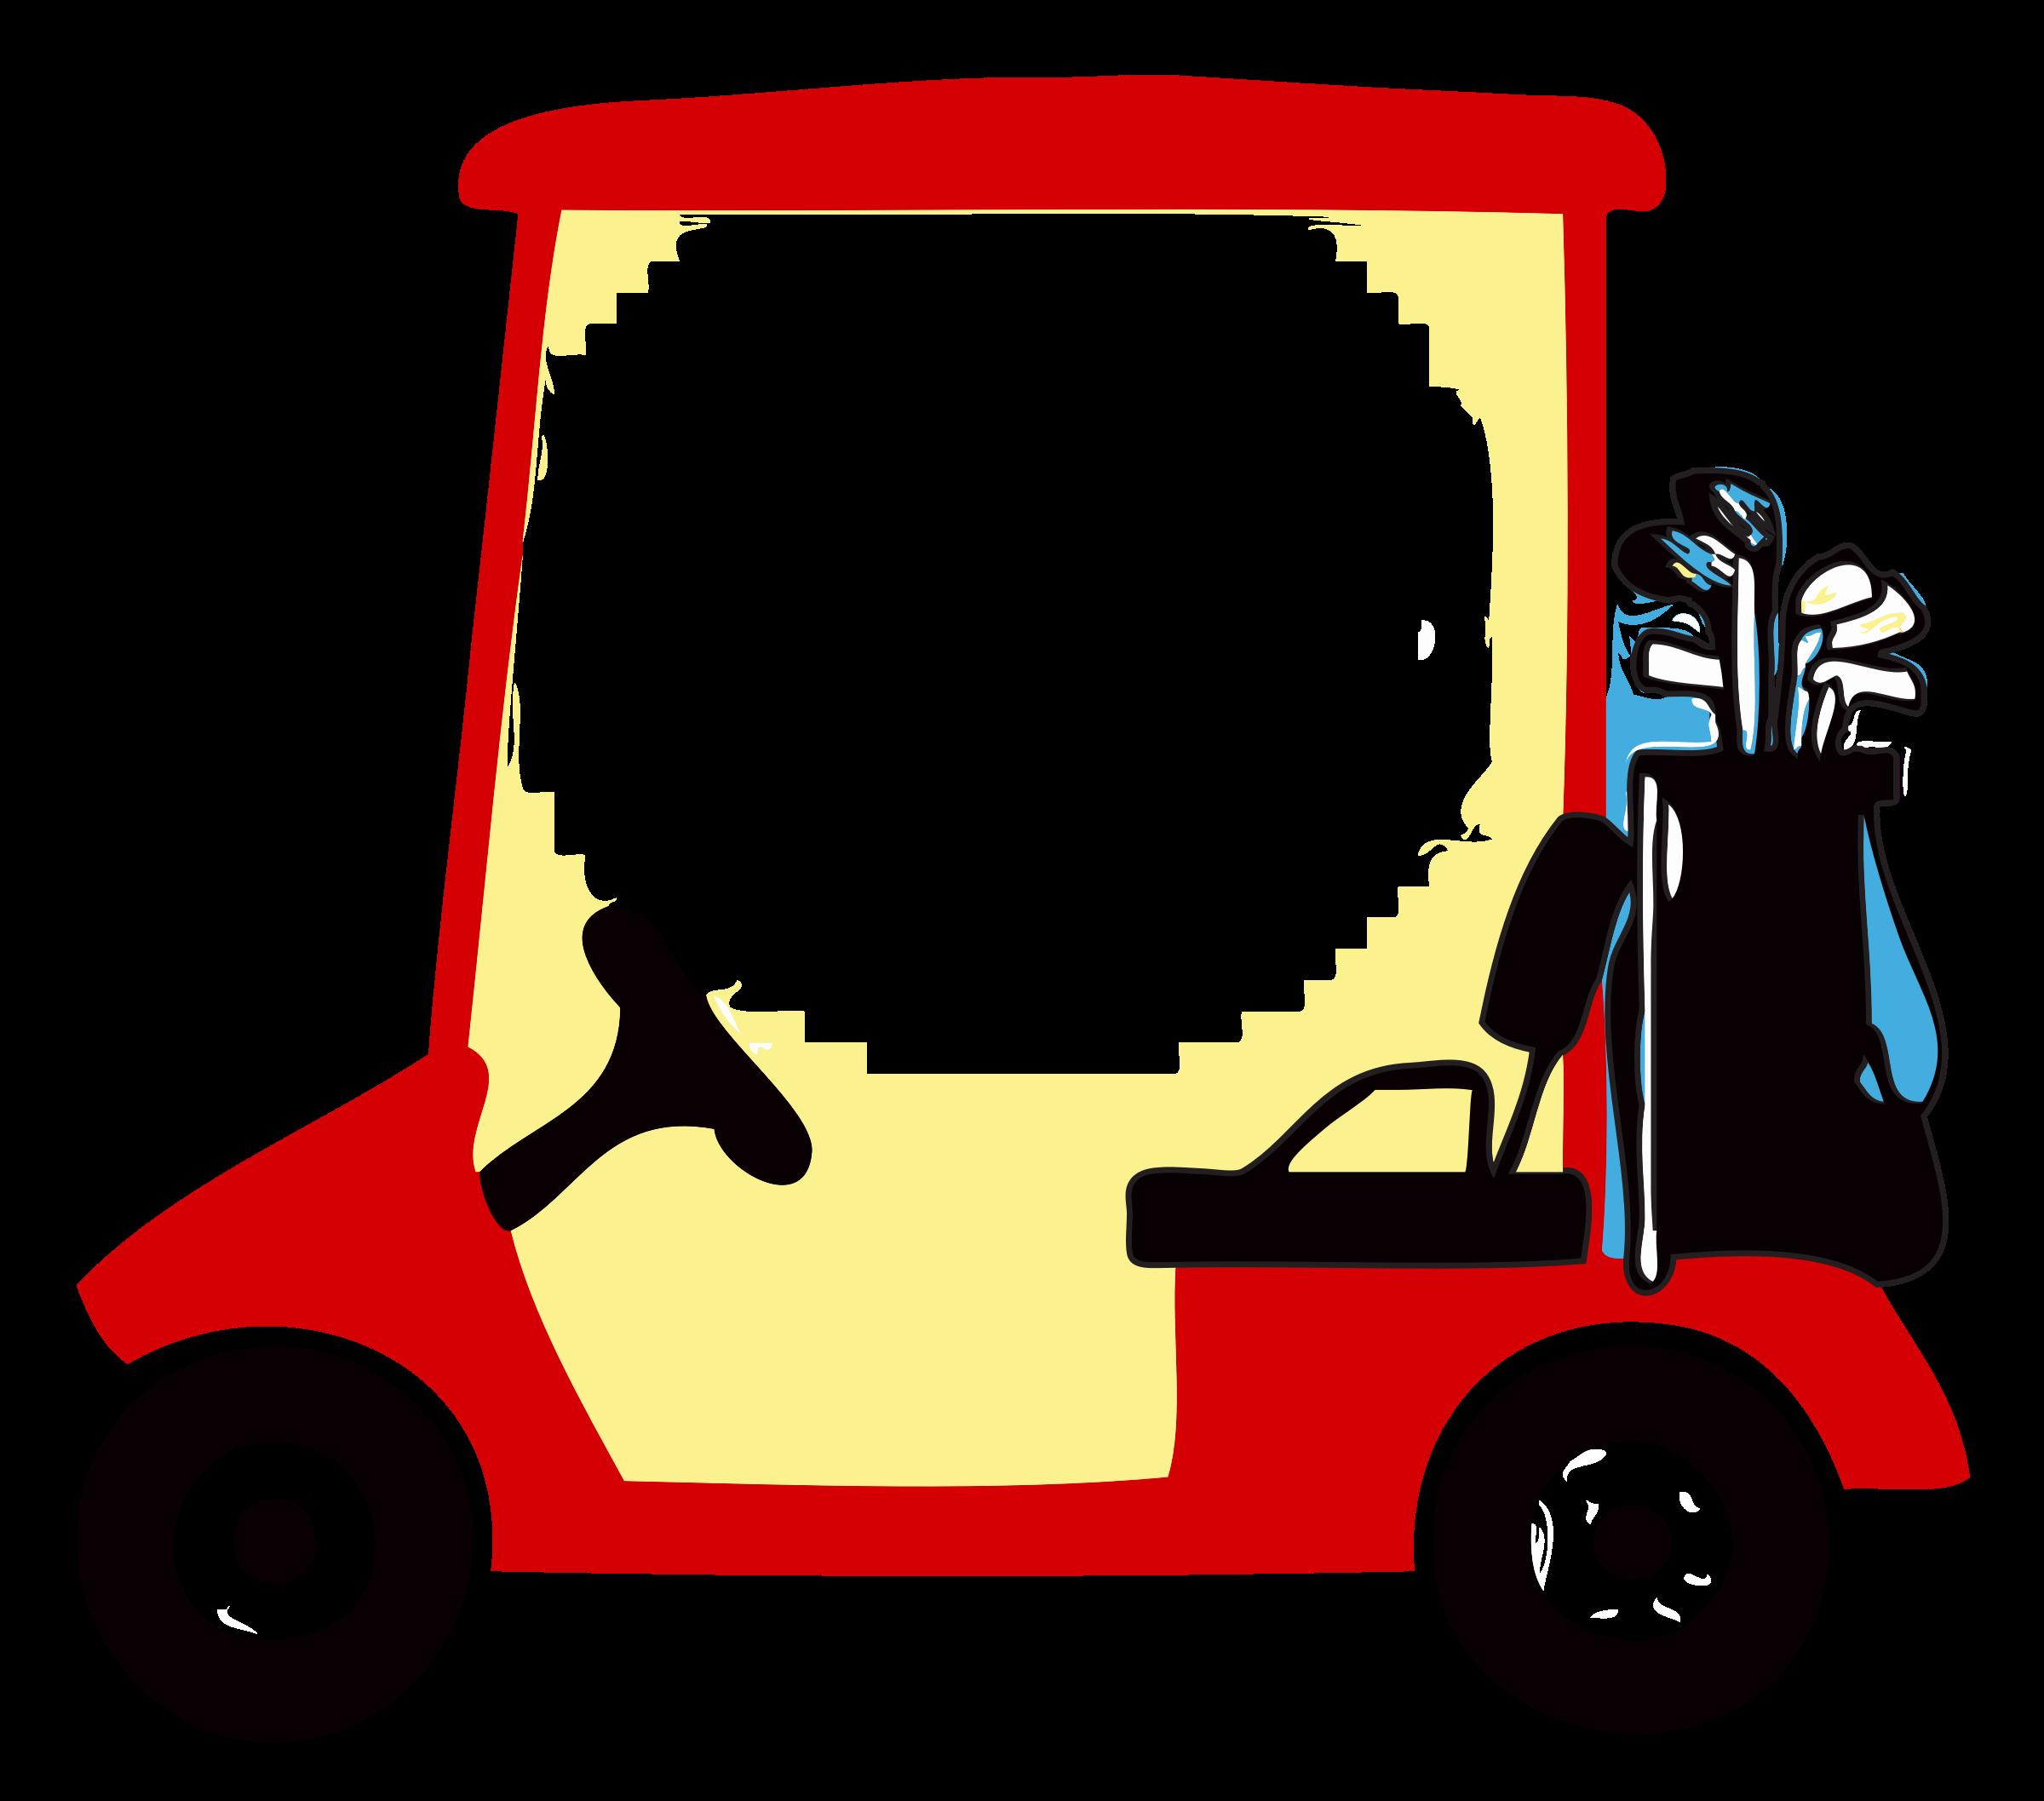 golf cart vector clipart image free stock photo public domain rh goodfreephotos com golf cart clip art cartoon golf cart clip art black and white